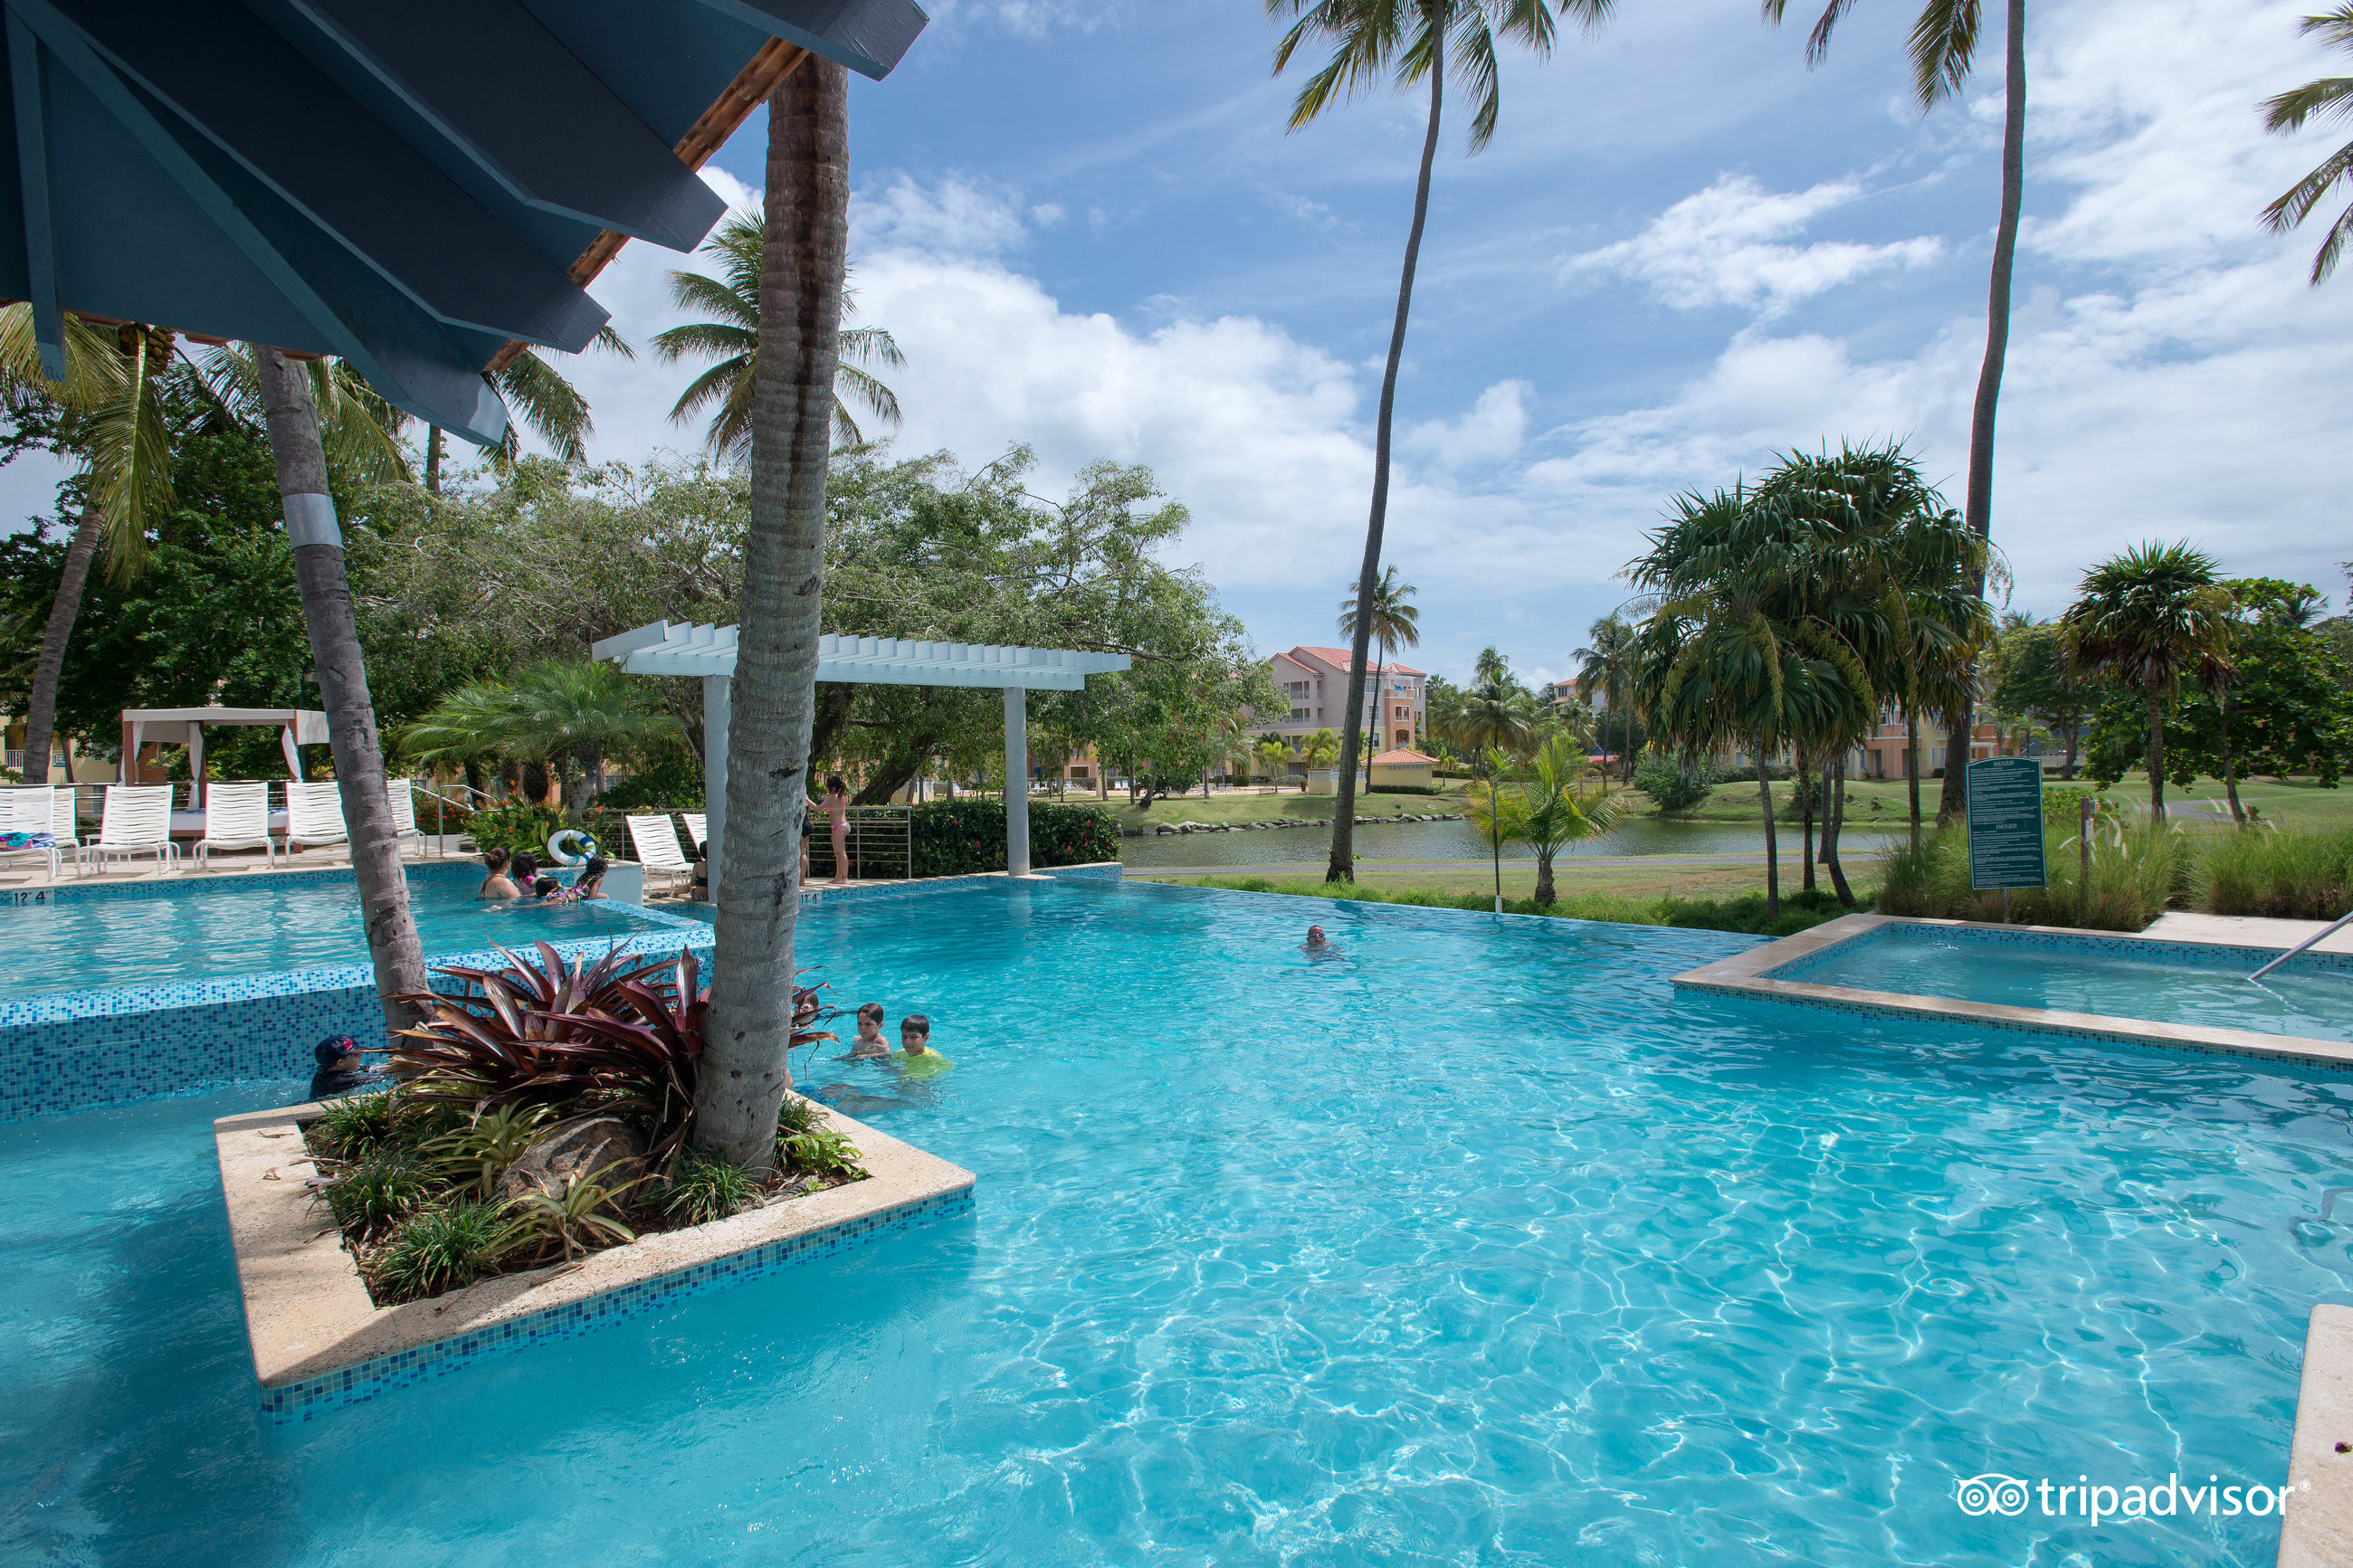 Wyndham Garden at Palmas del Mar (Humacao) 2017 Hotel Review ...